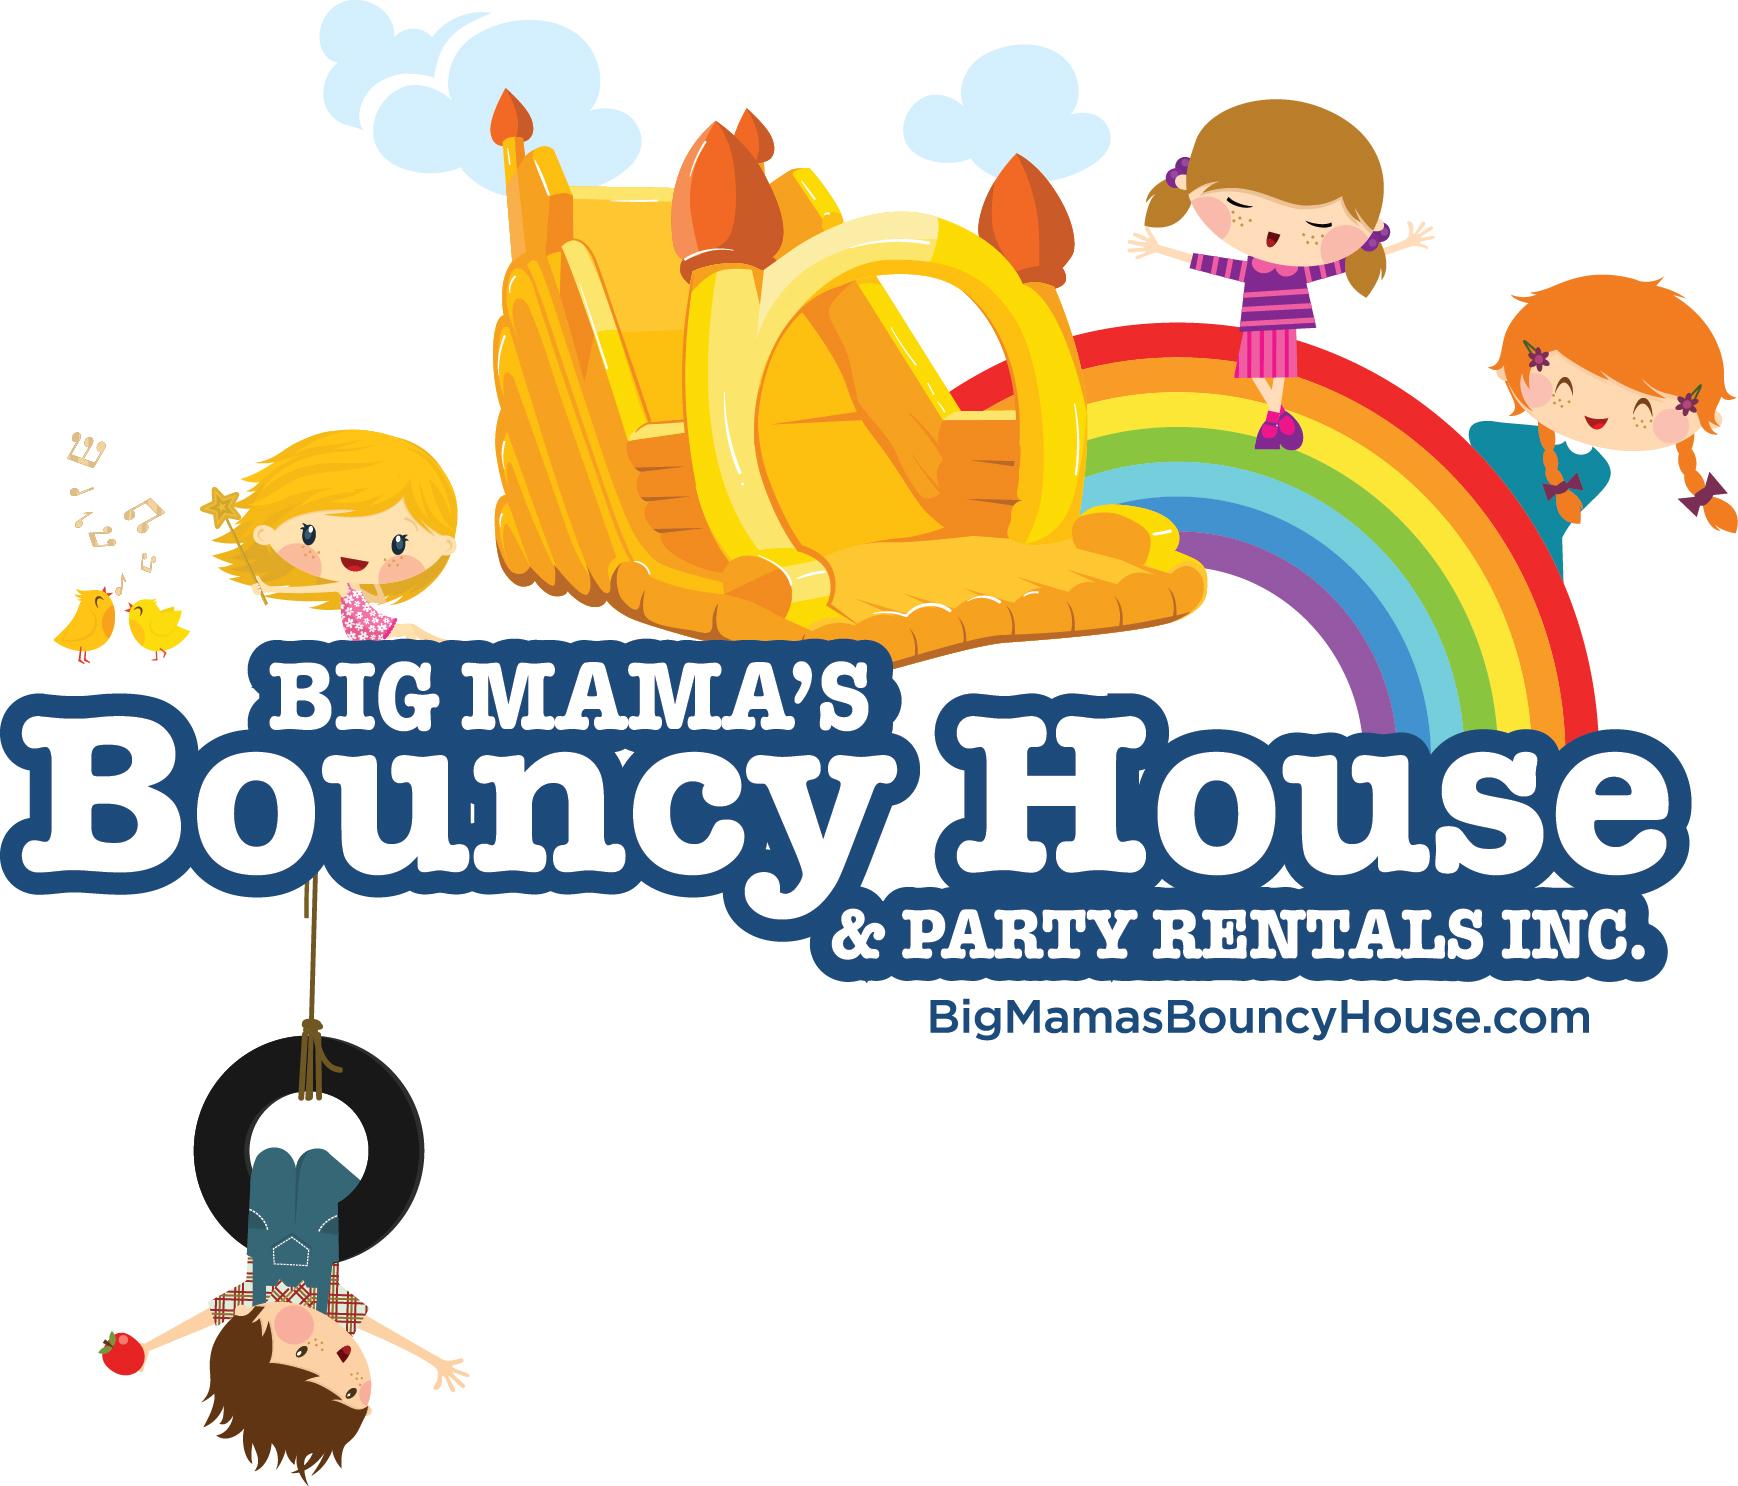 BigMama'sBouncyHouse&PartyRentalsInc_Vs4.jpg